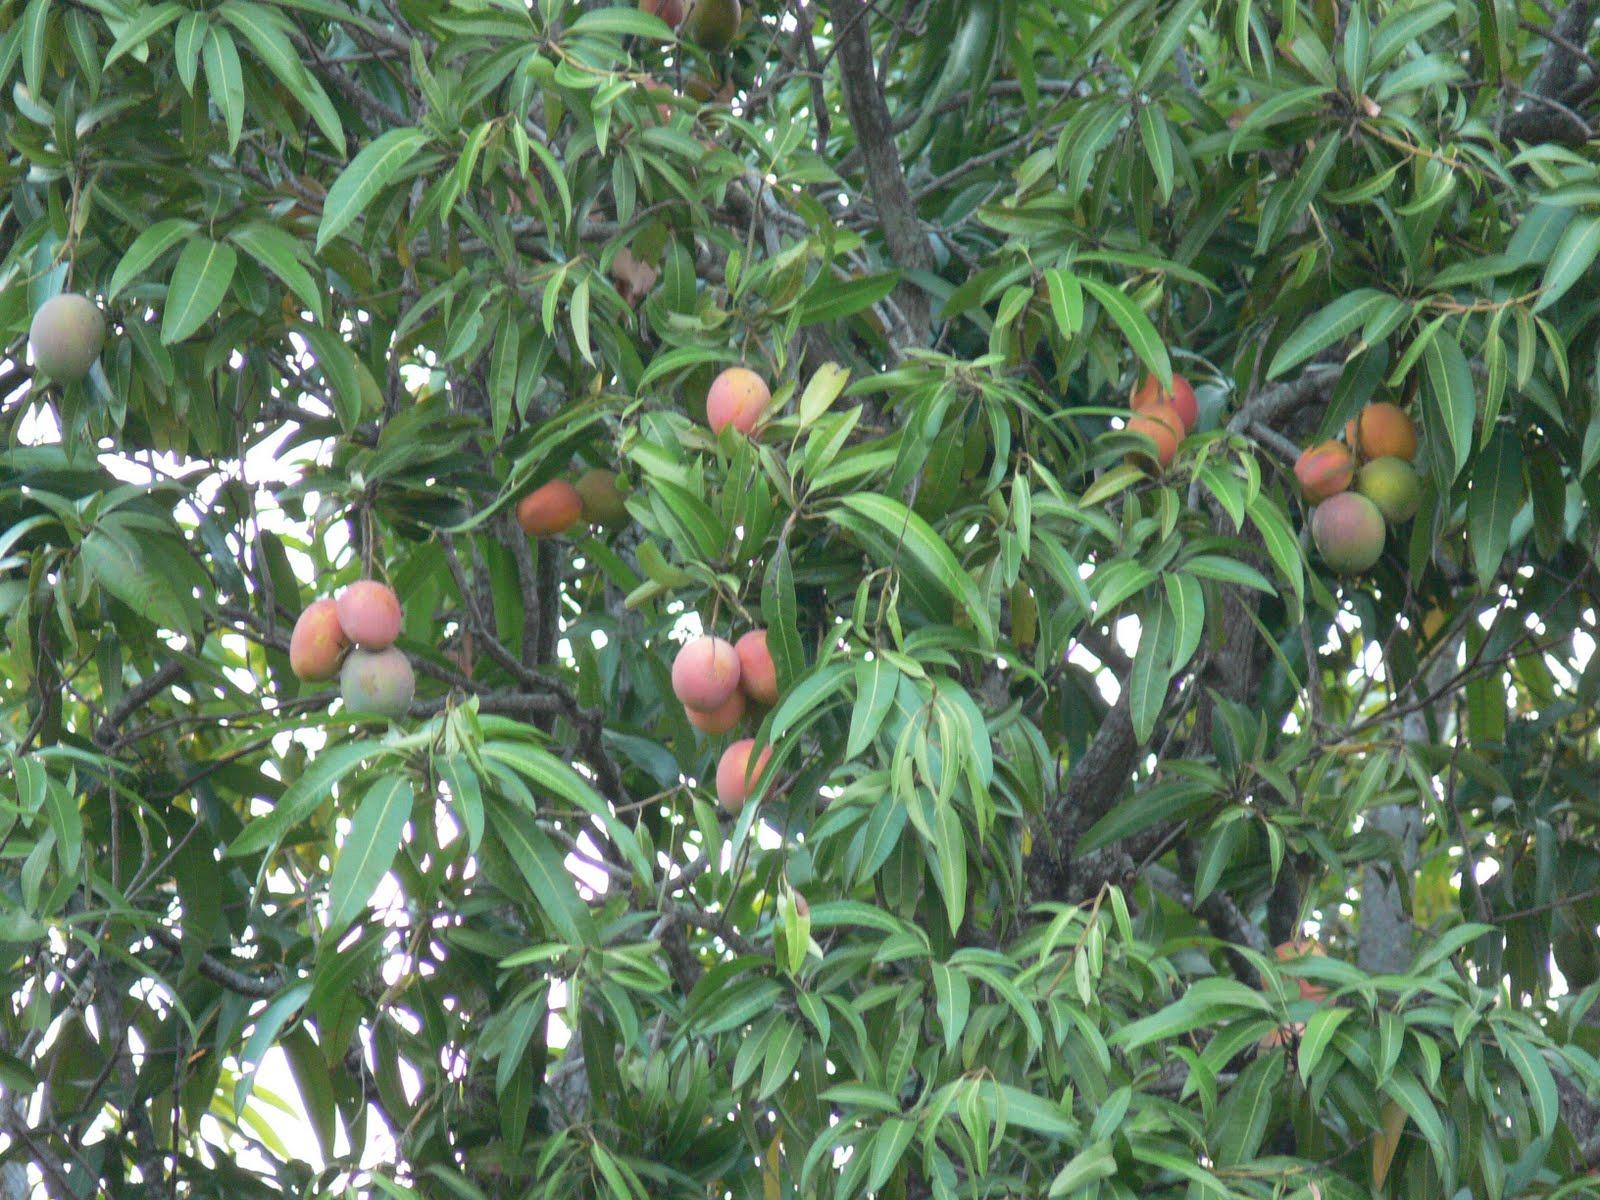 http://4.bp.blogspot.com/-XWjDKggGjGw/Td8gYVw1iTI/AAAAAAAACmc/7V5l7rk5z3Y/s1600/mango%252Btree.jpg